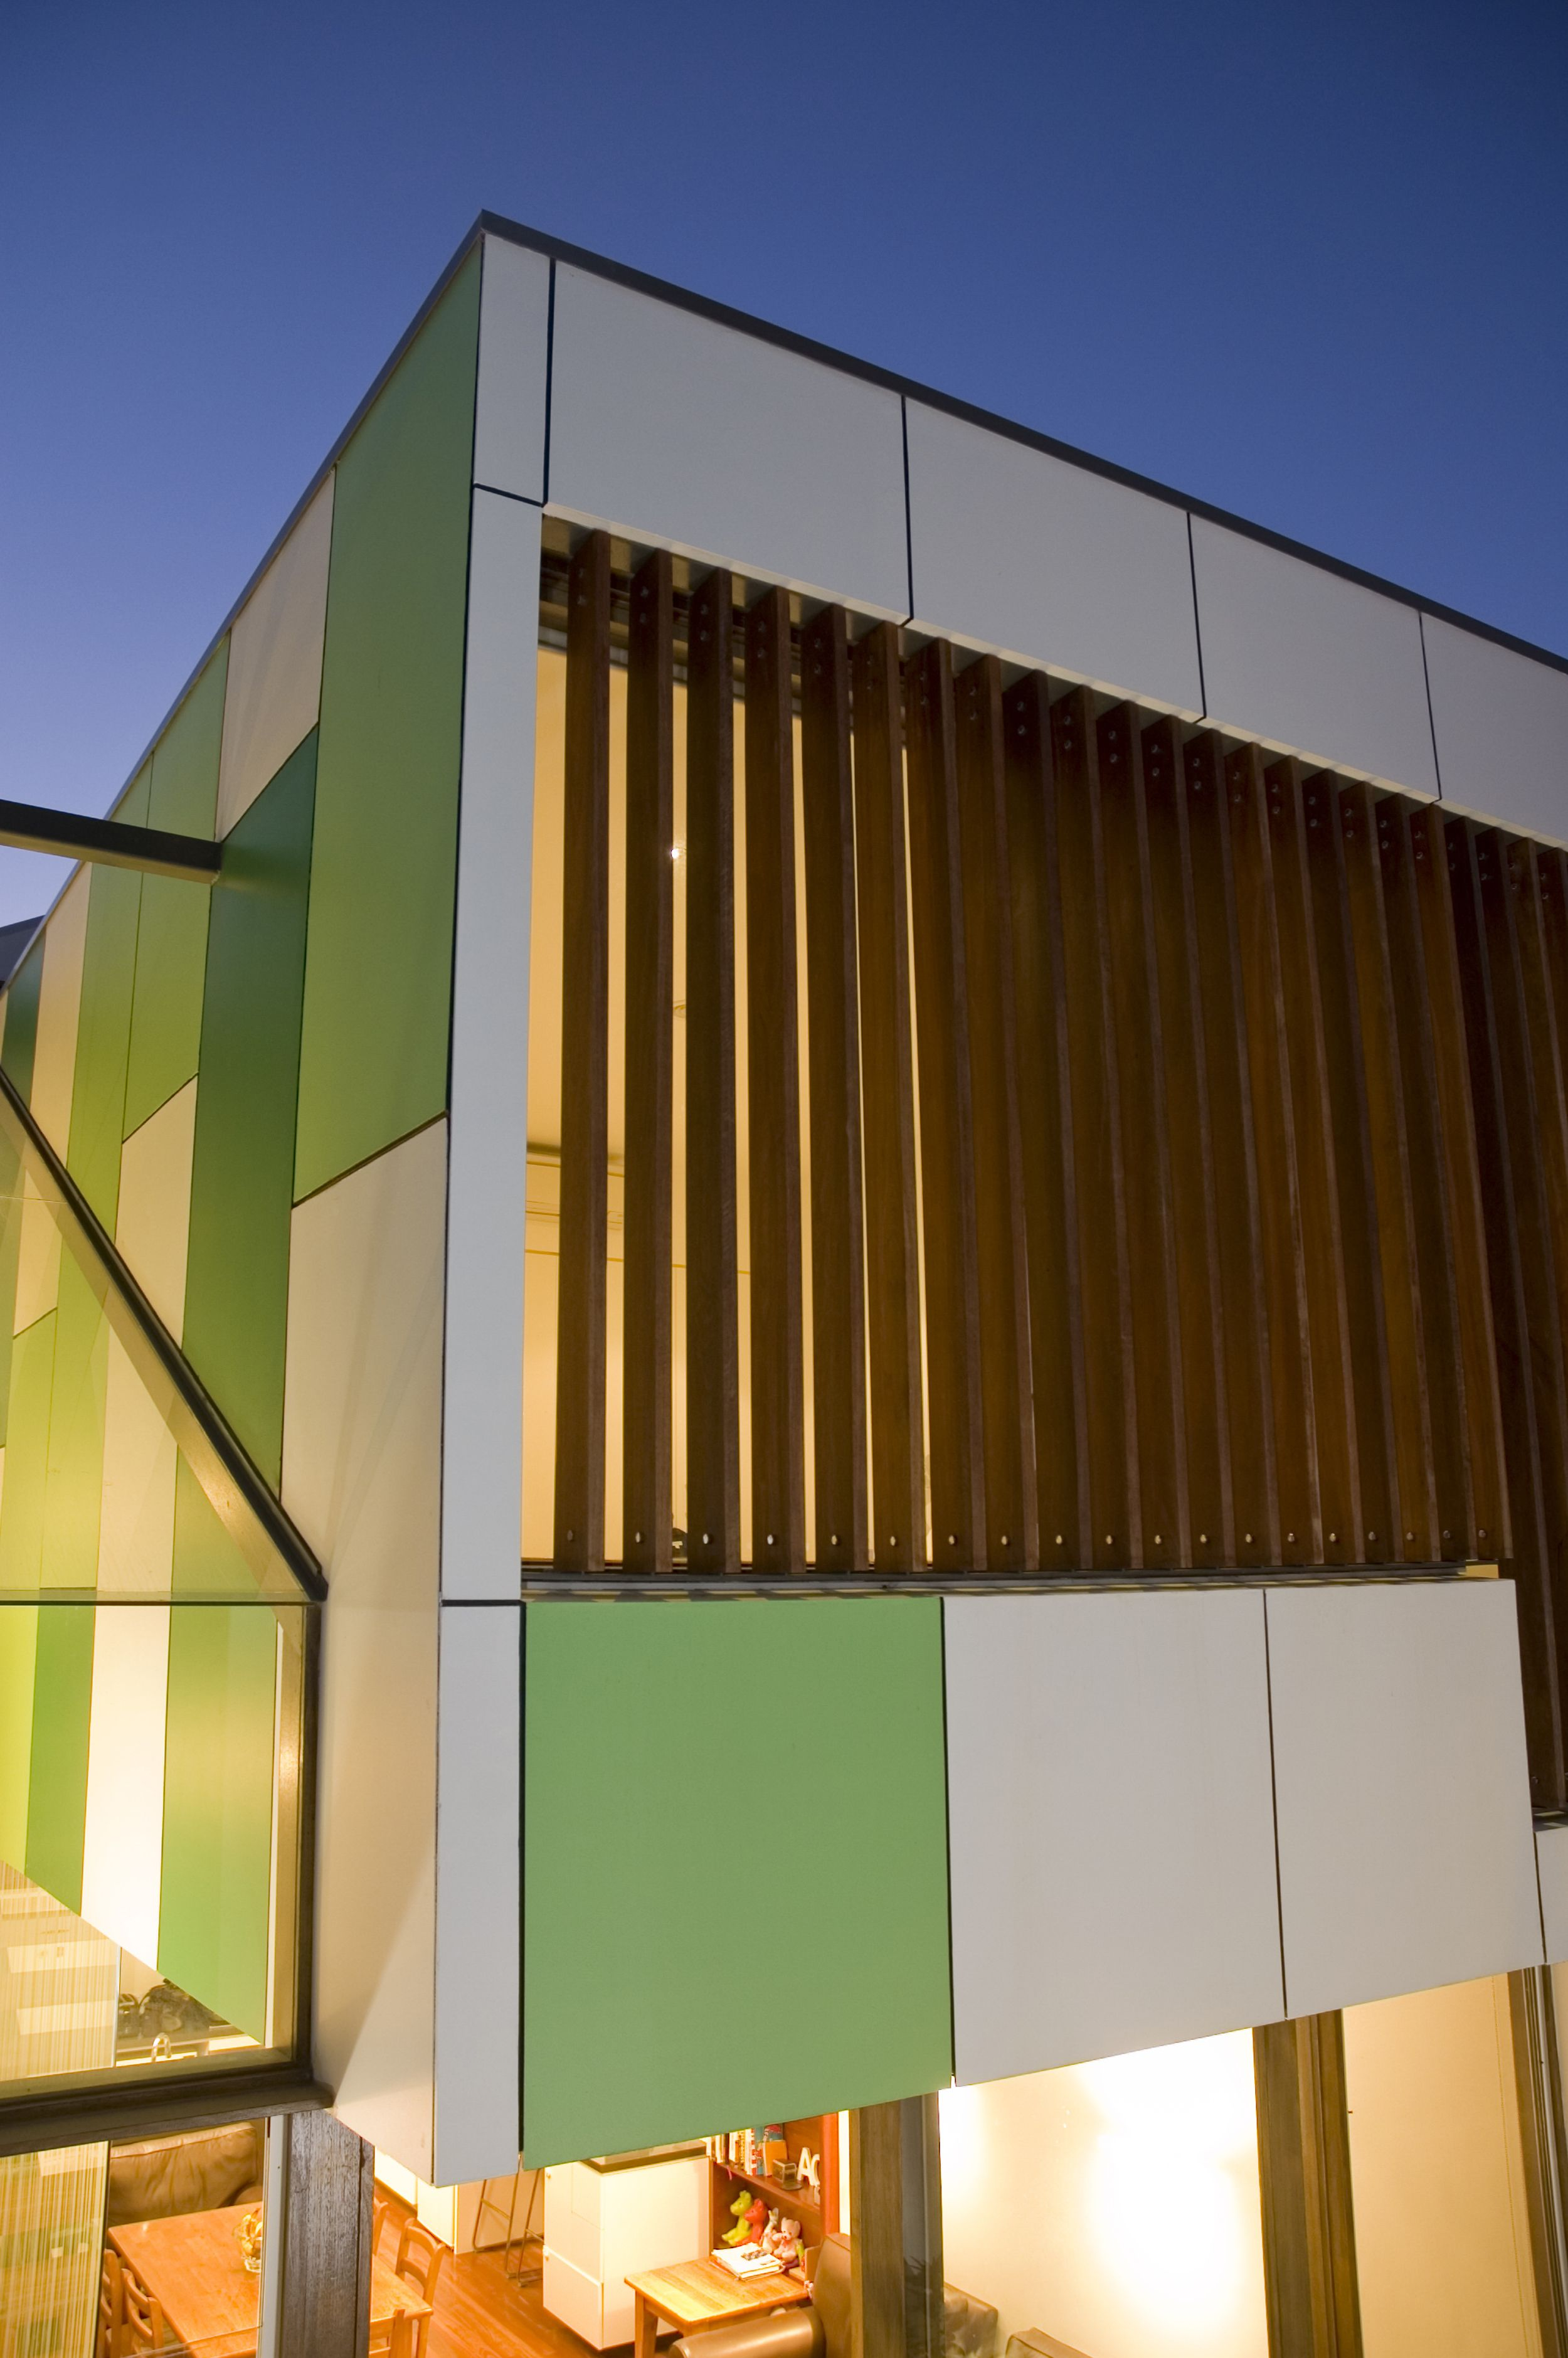 Get The Cube Look With Scyon Matrix Cladding Interior